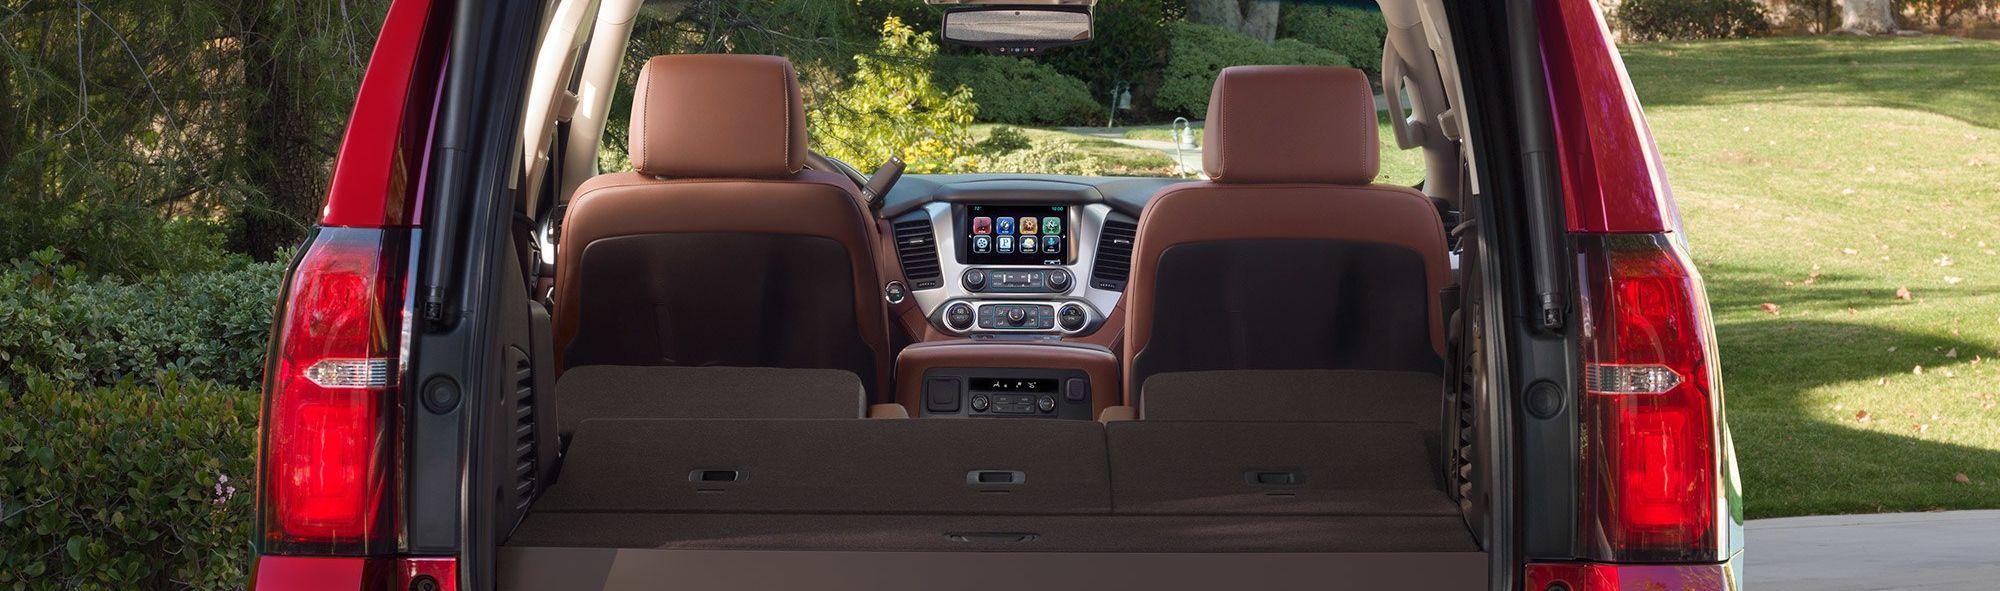 2019 Chevrolet Tahoe Trunk Space